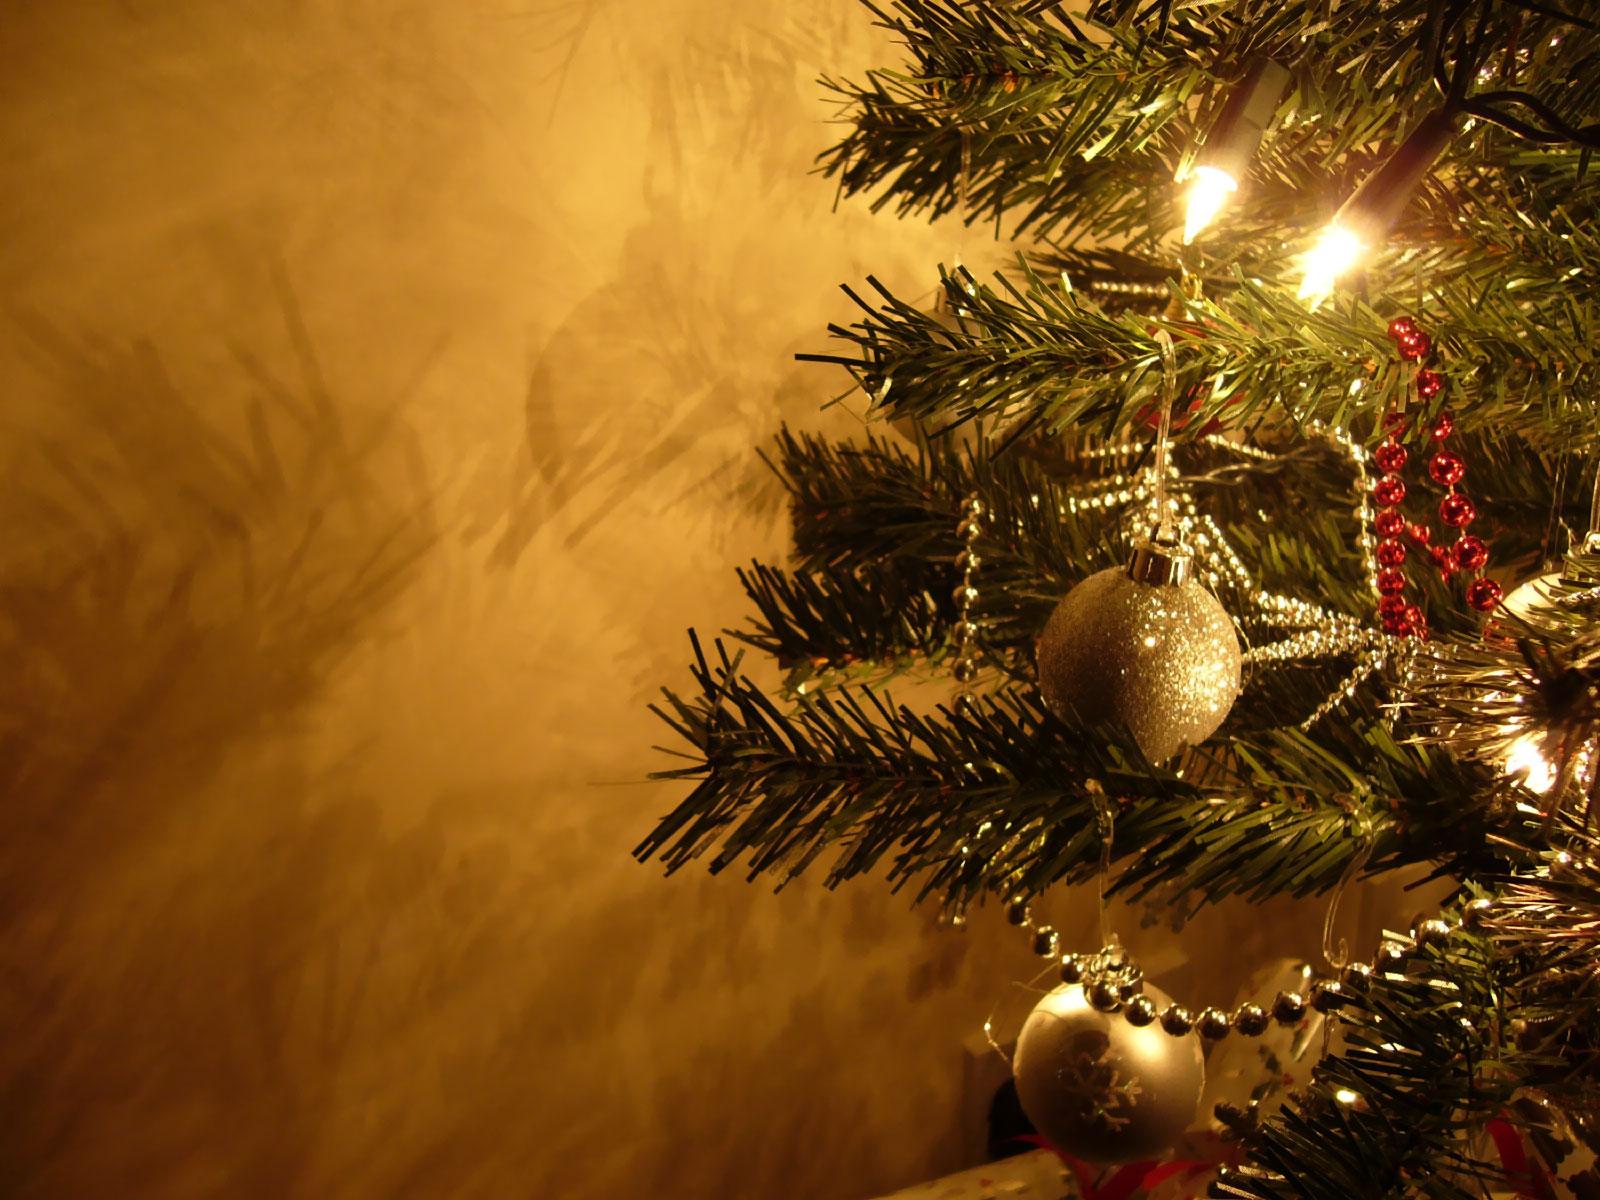 christmas-wallpaper-fondos-navidad-0022